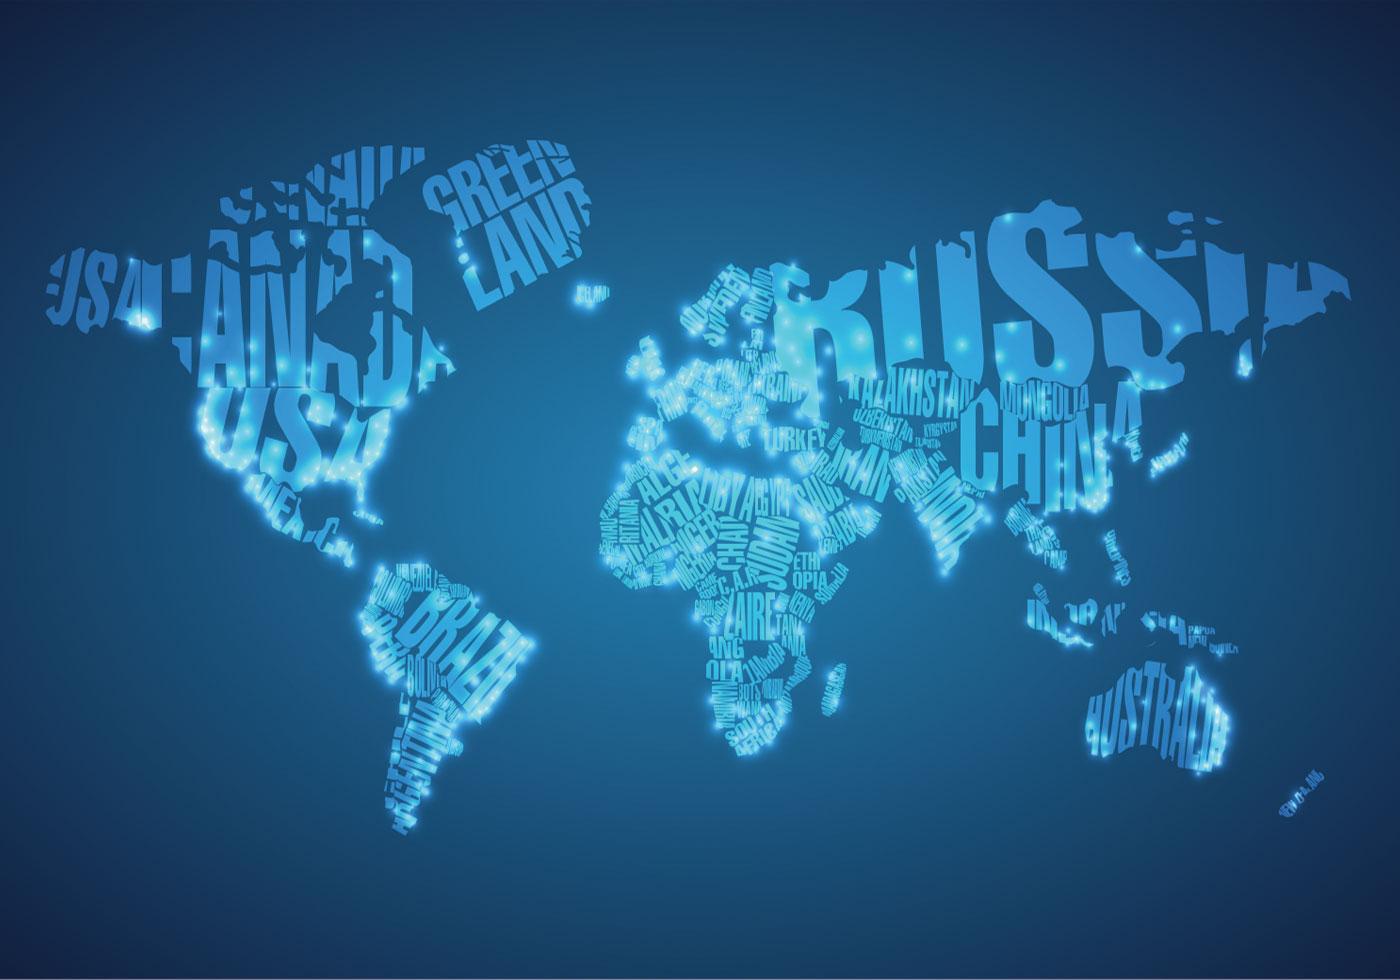 Cute World Map Wallpaper Big City Lights On World Map Vector Download Free Vector